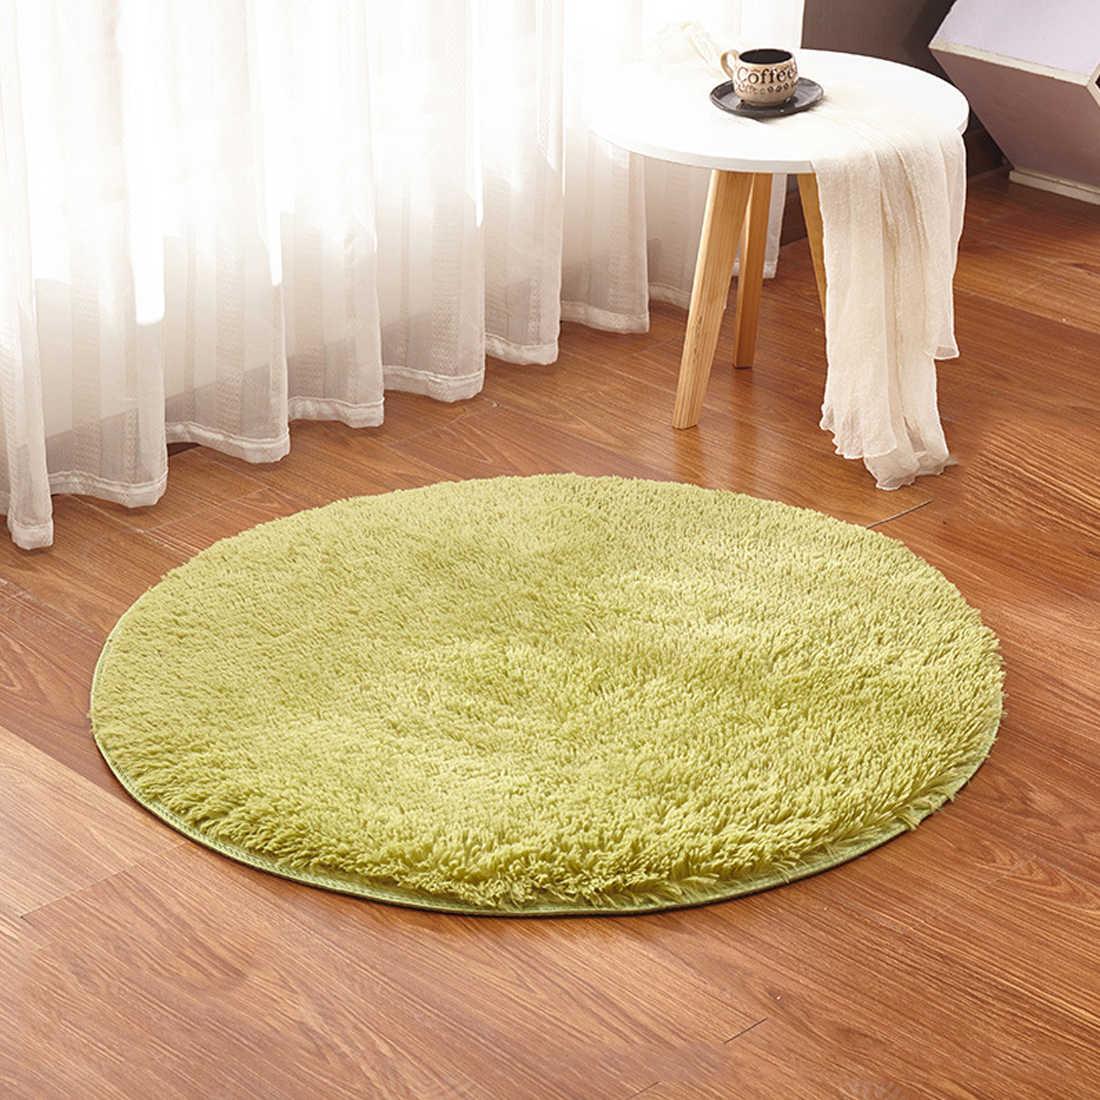 Fluffy Round Rug Carpets For Living Room Modern Faux Fur Shaggy Carpet Kids Room Long Plush Rugs For Living Room Bedroom